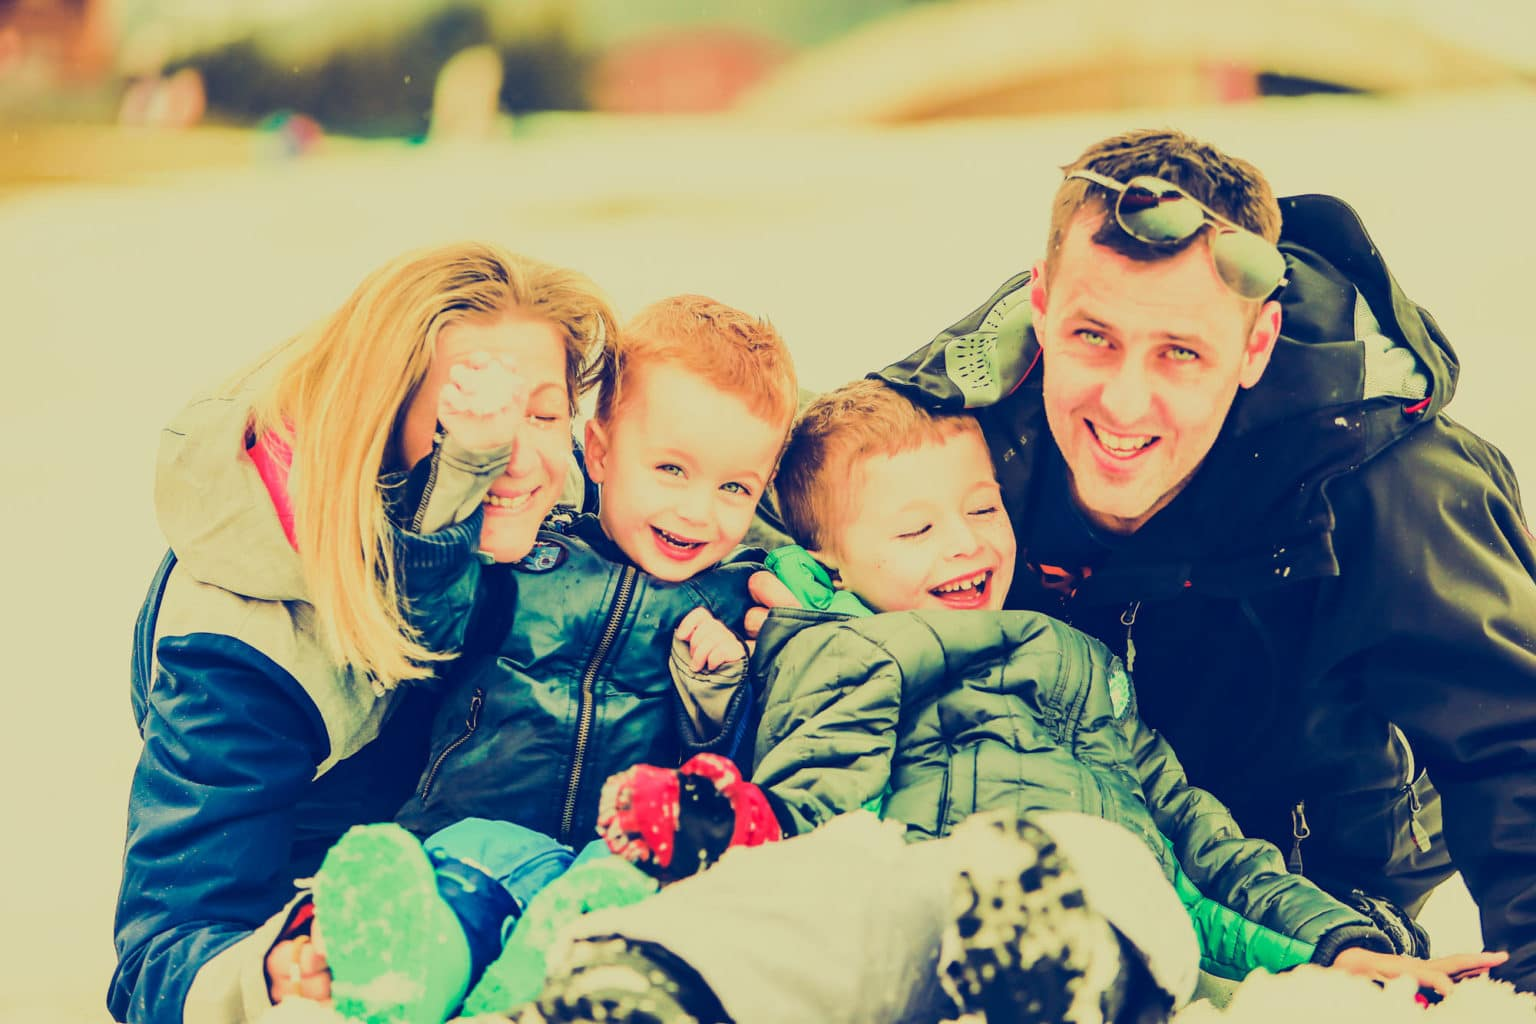 Die Familie Kieffer Spohr im Urlaub am Ferienort l'Alpe d'Huez